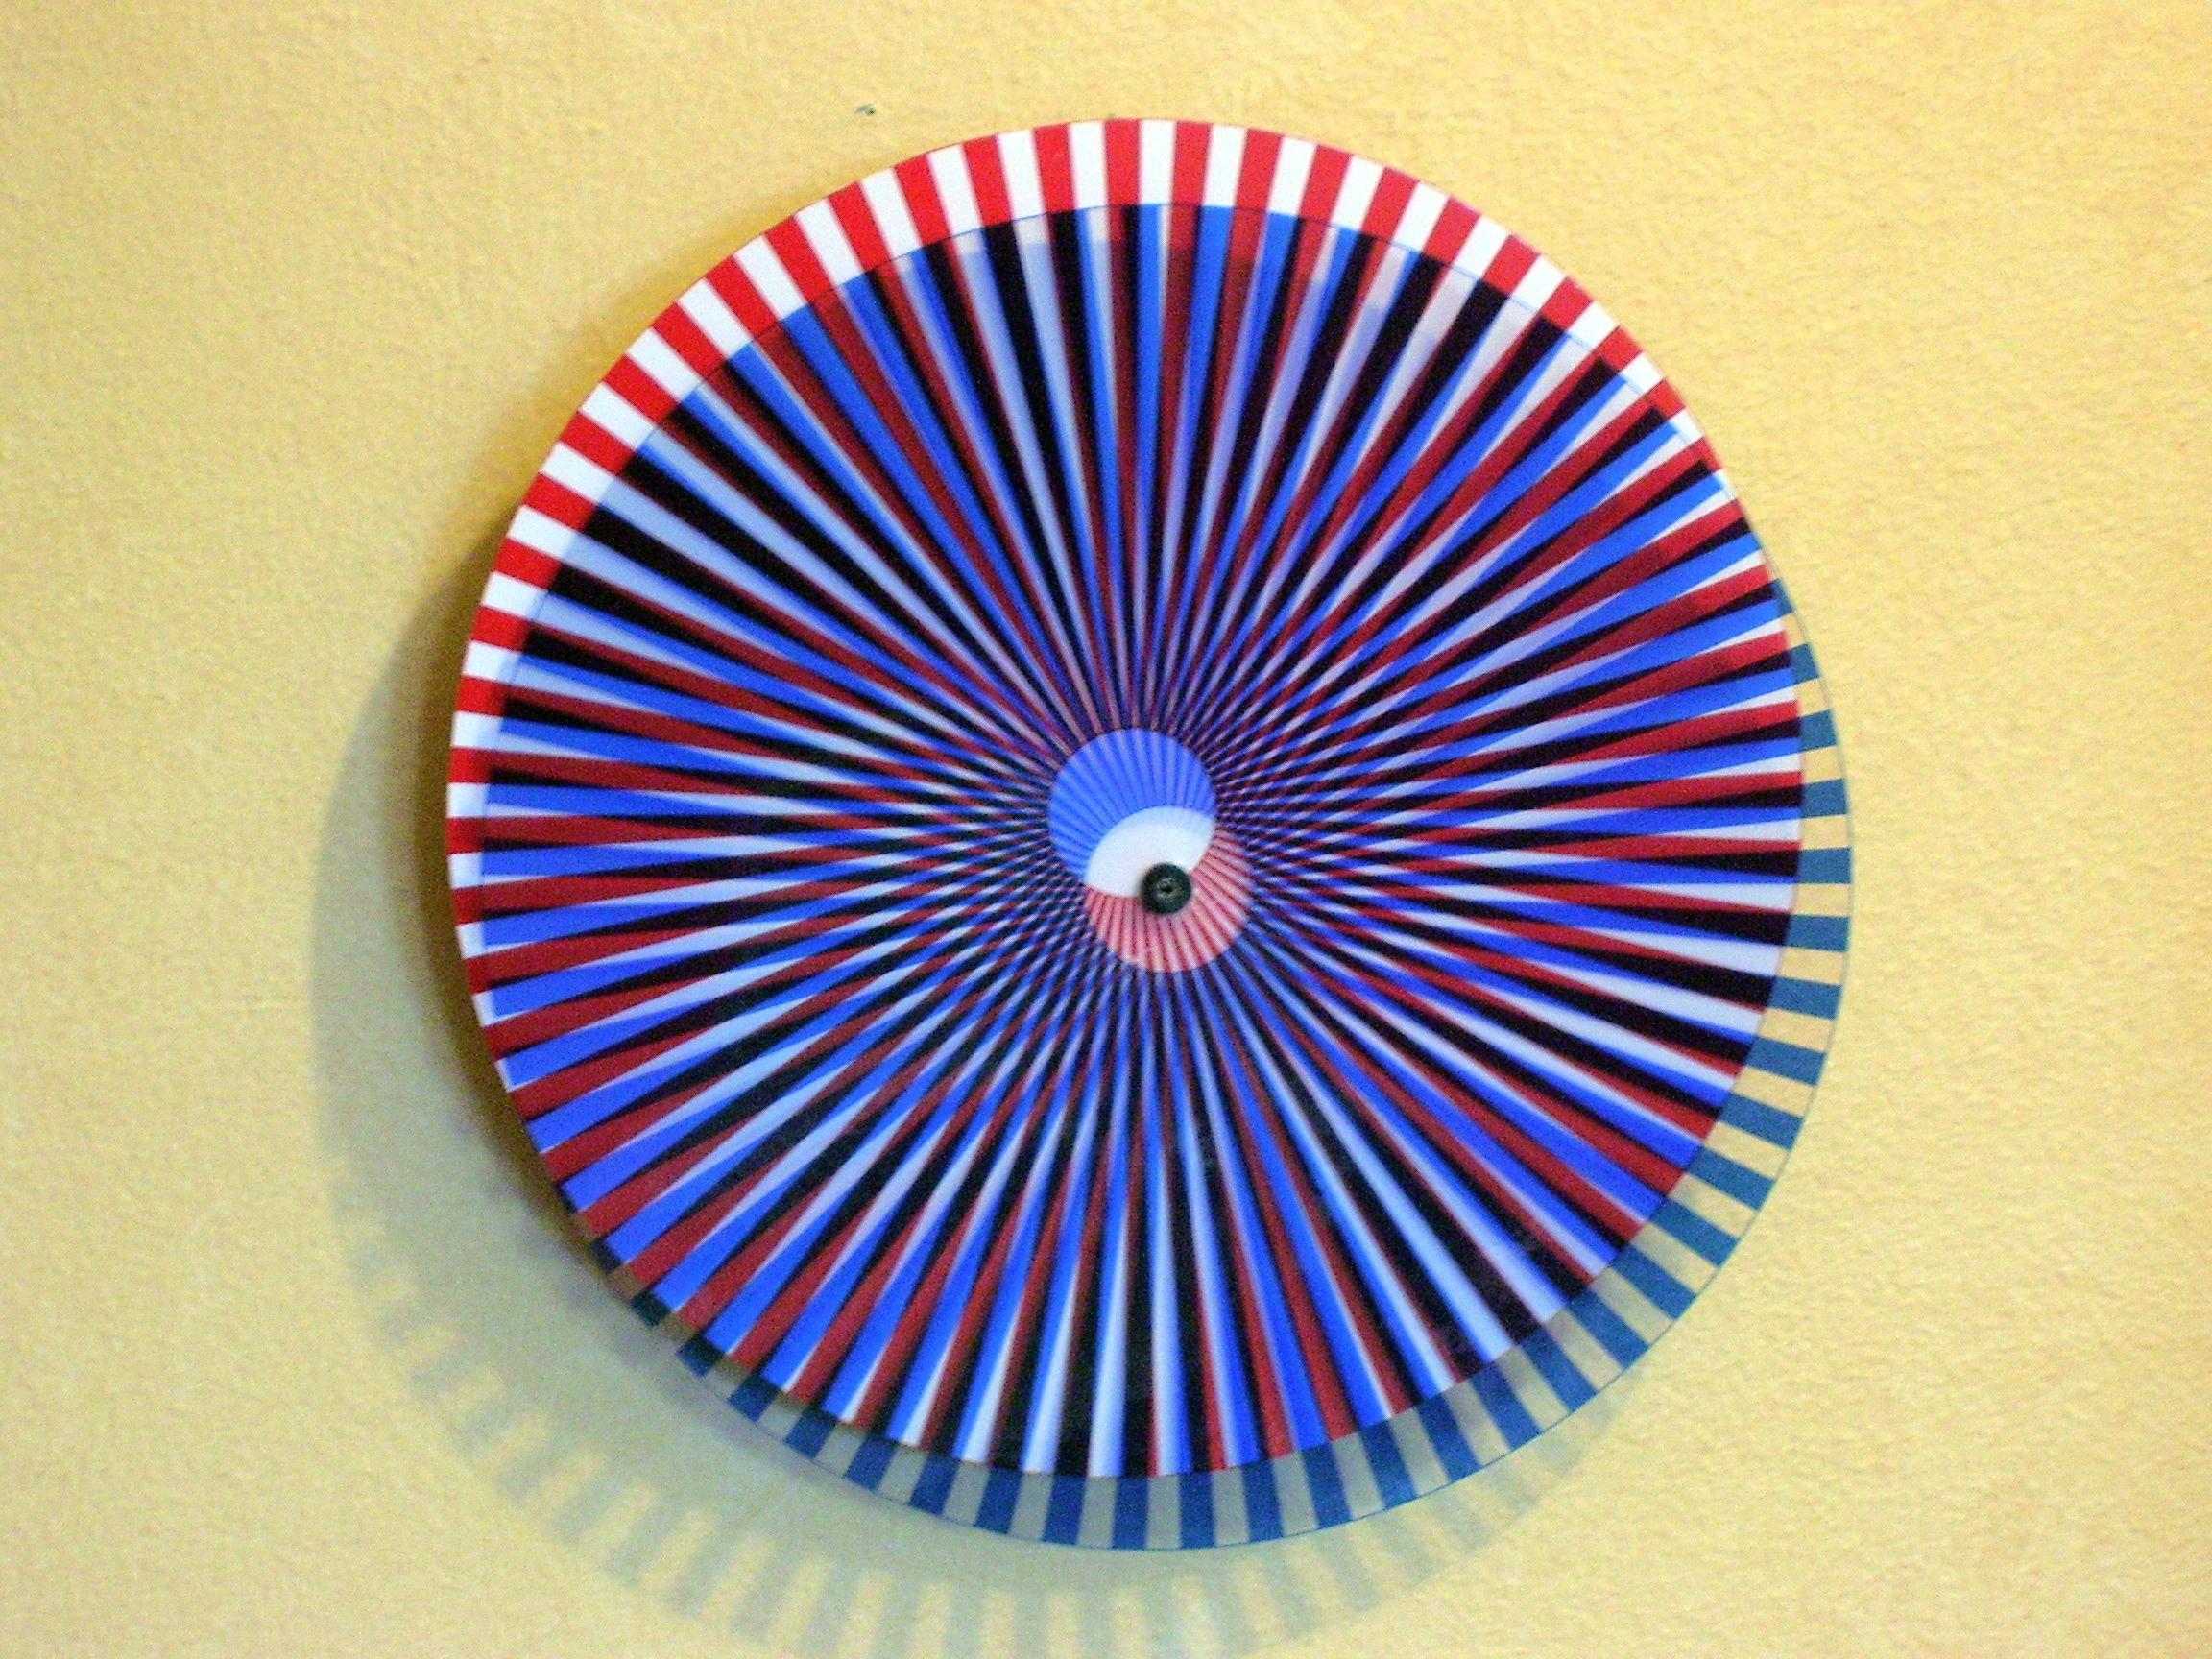 Repurposed - Clock into Kinetic Wall Art